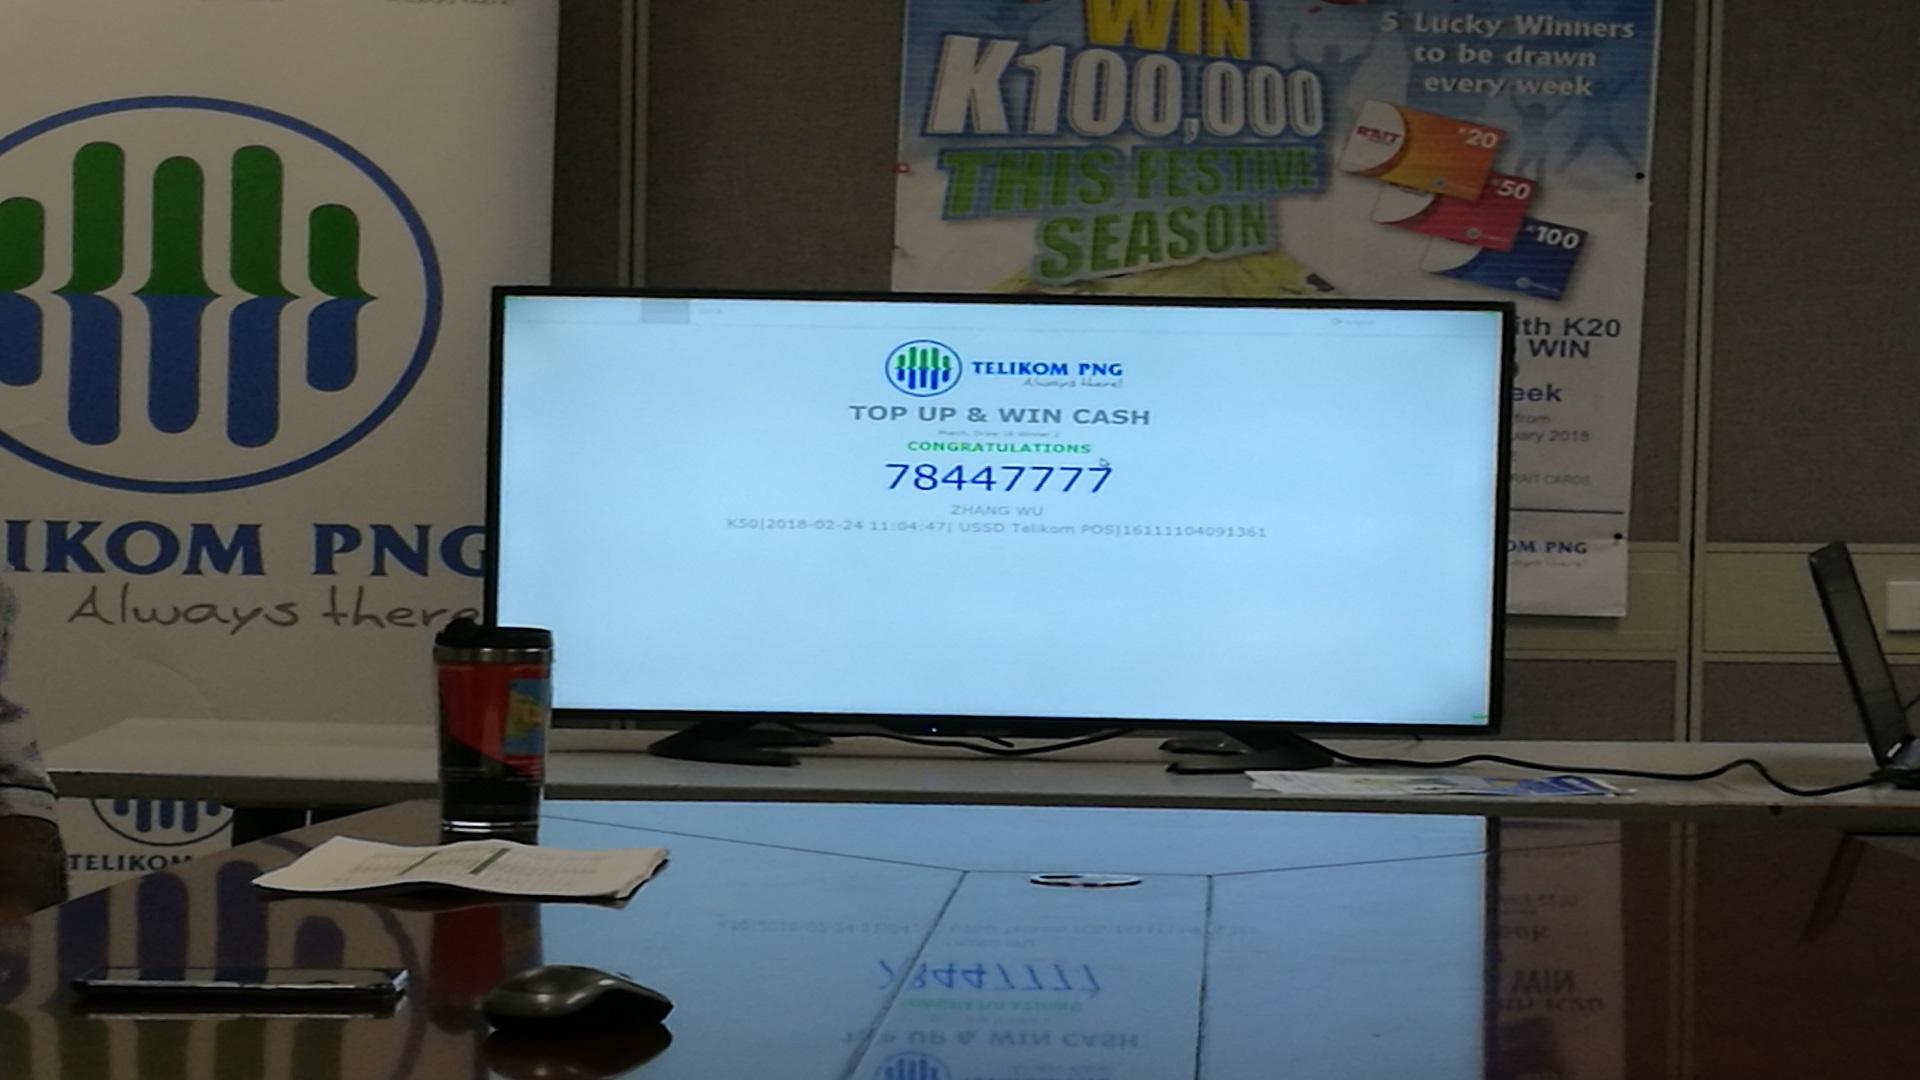 Telikom\'s K100,000 Cash Promotion Concludes.